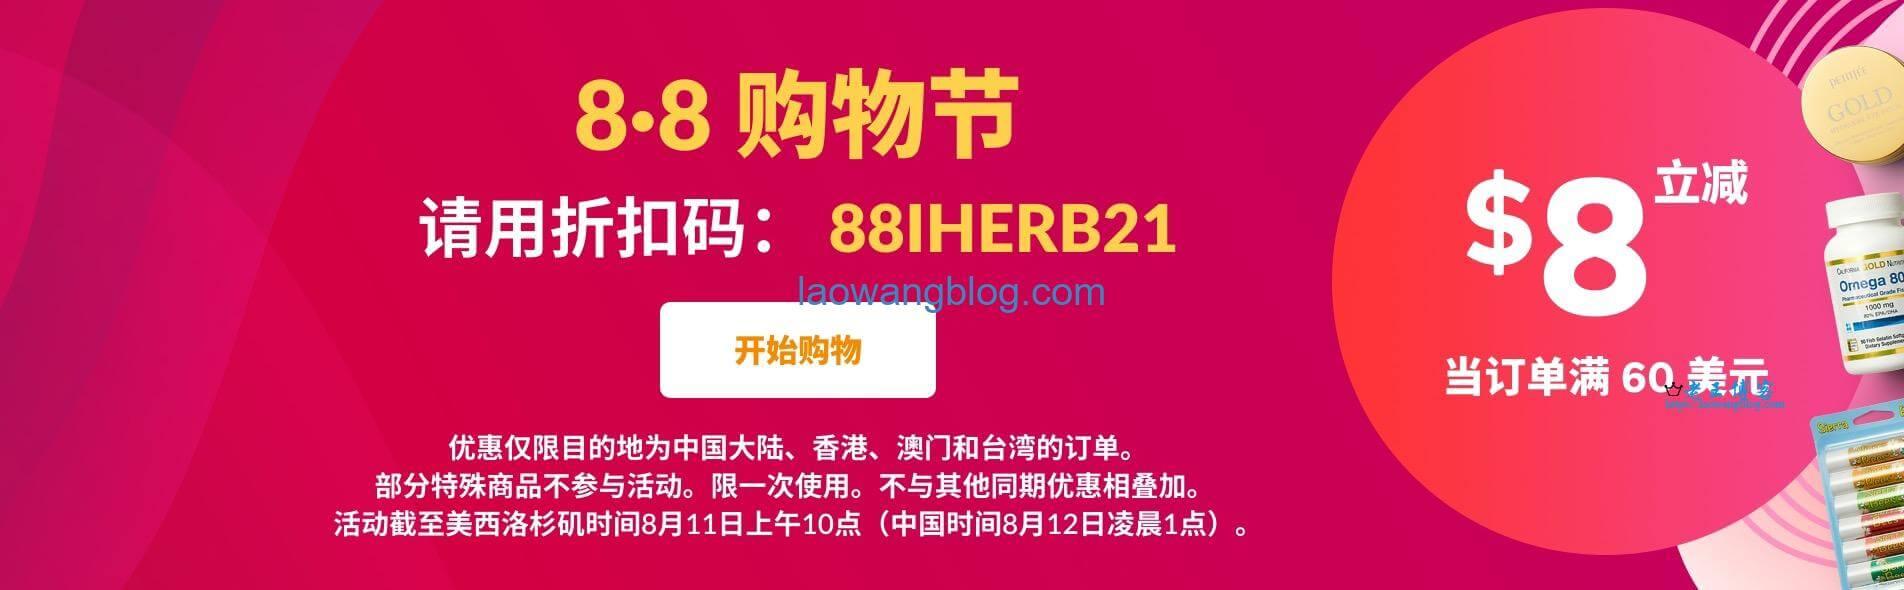 iHerb 88 购物节